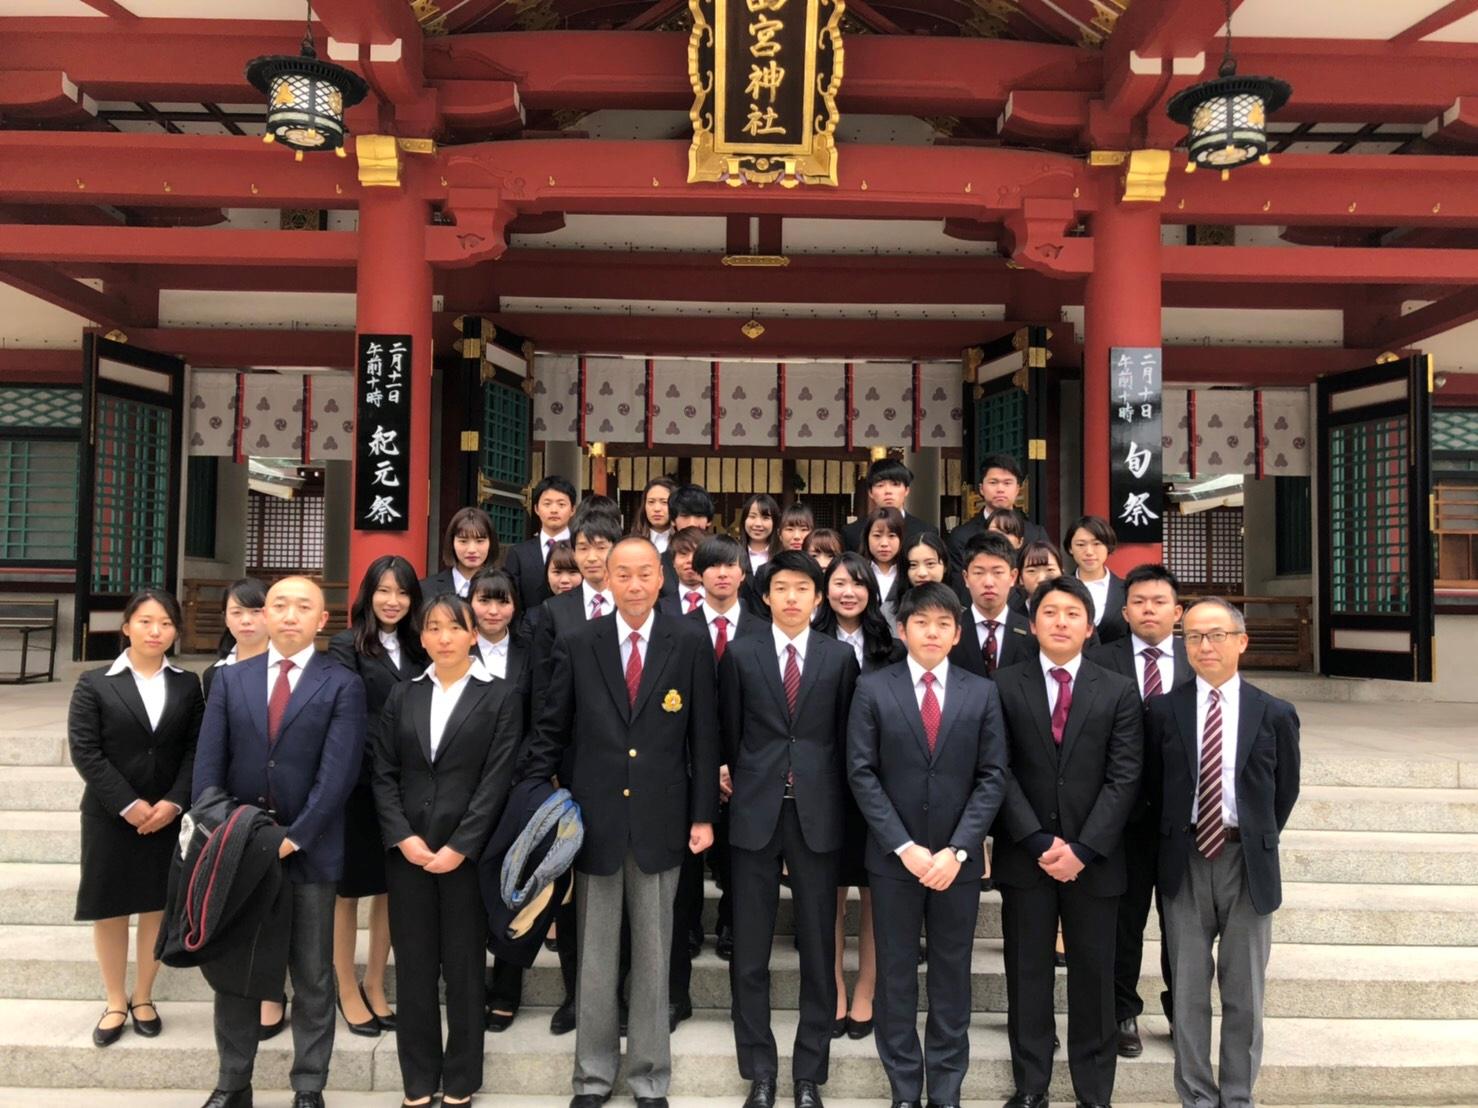 神社参拝2019.png